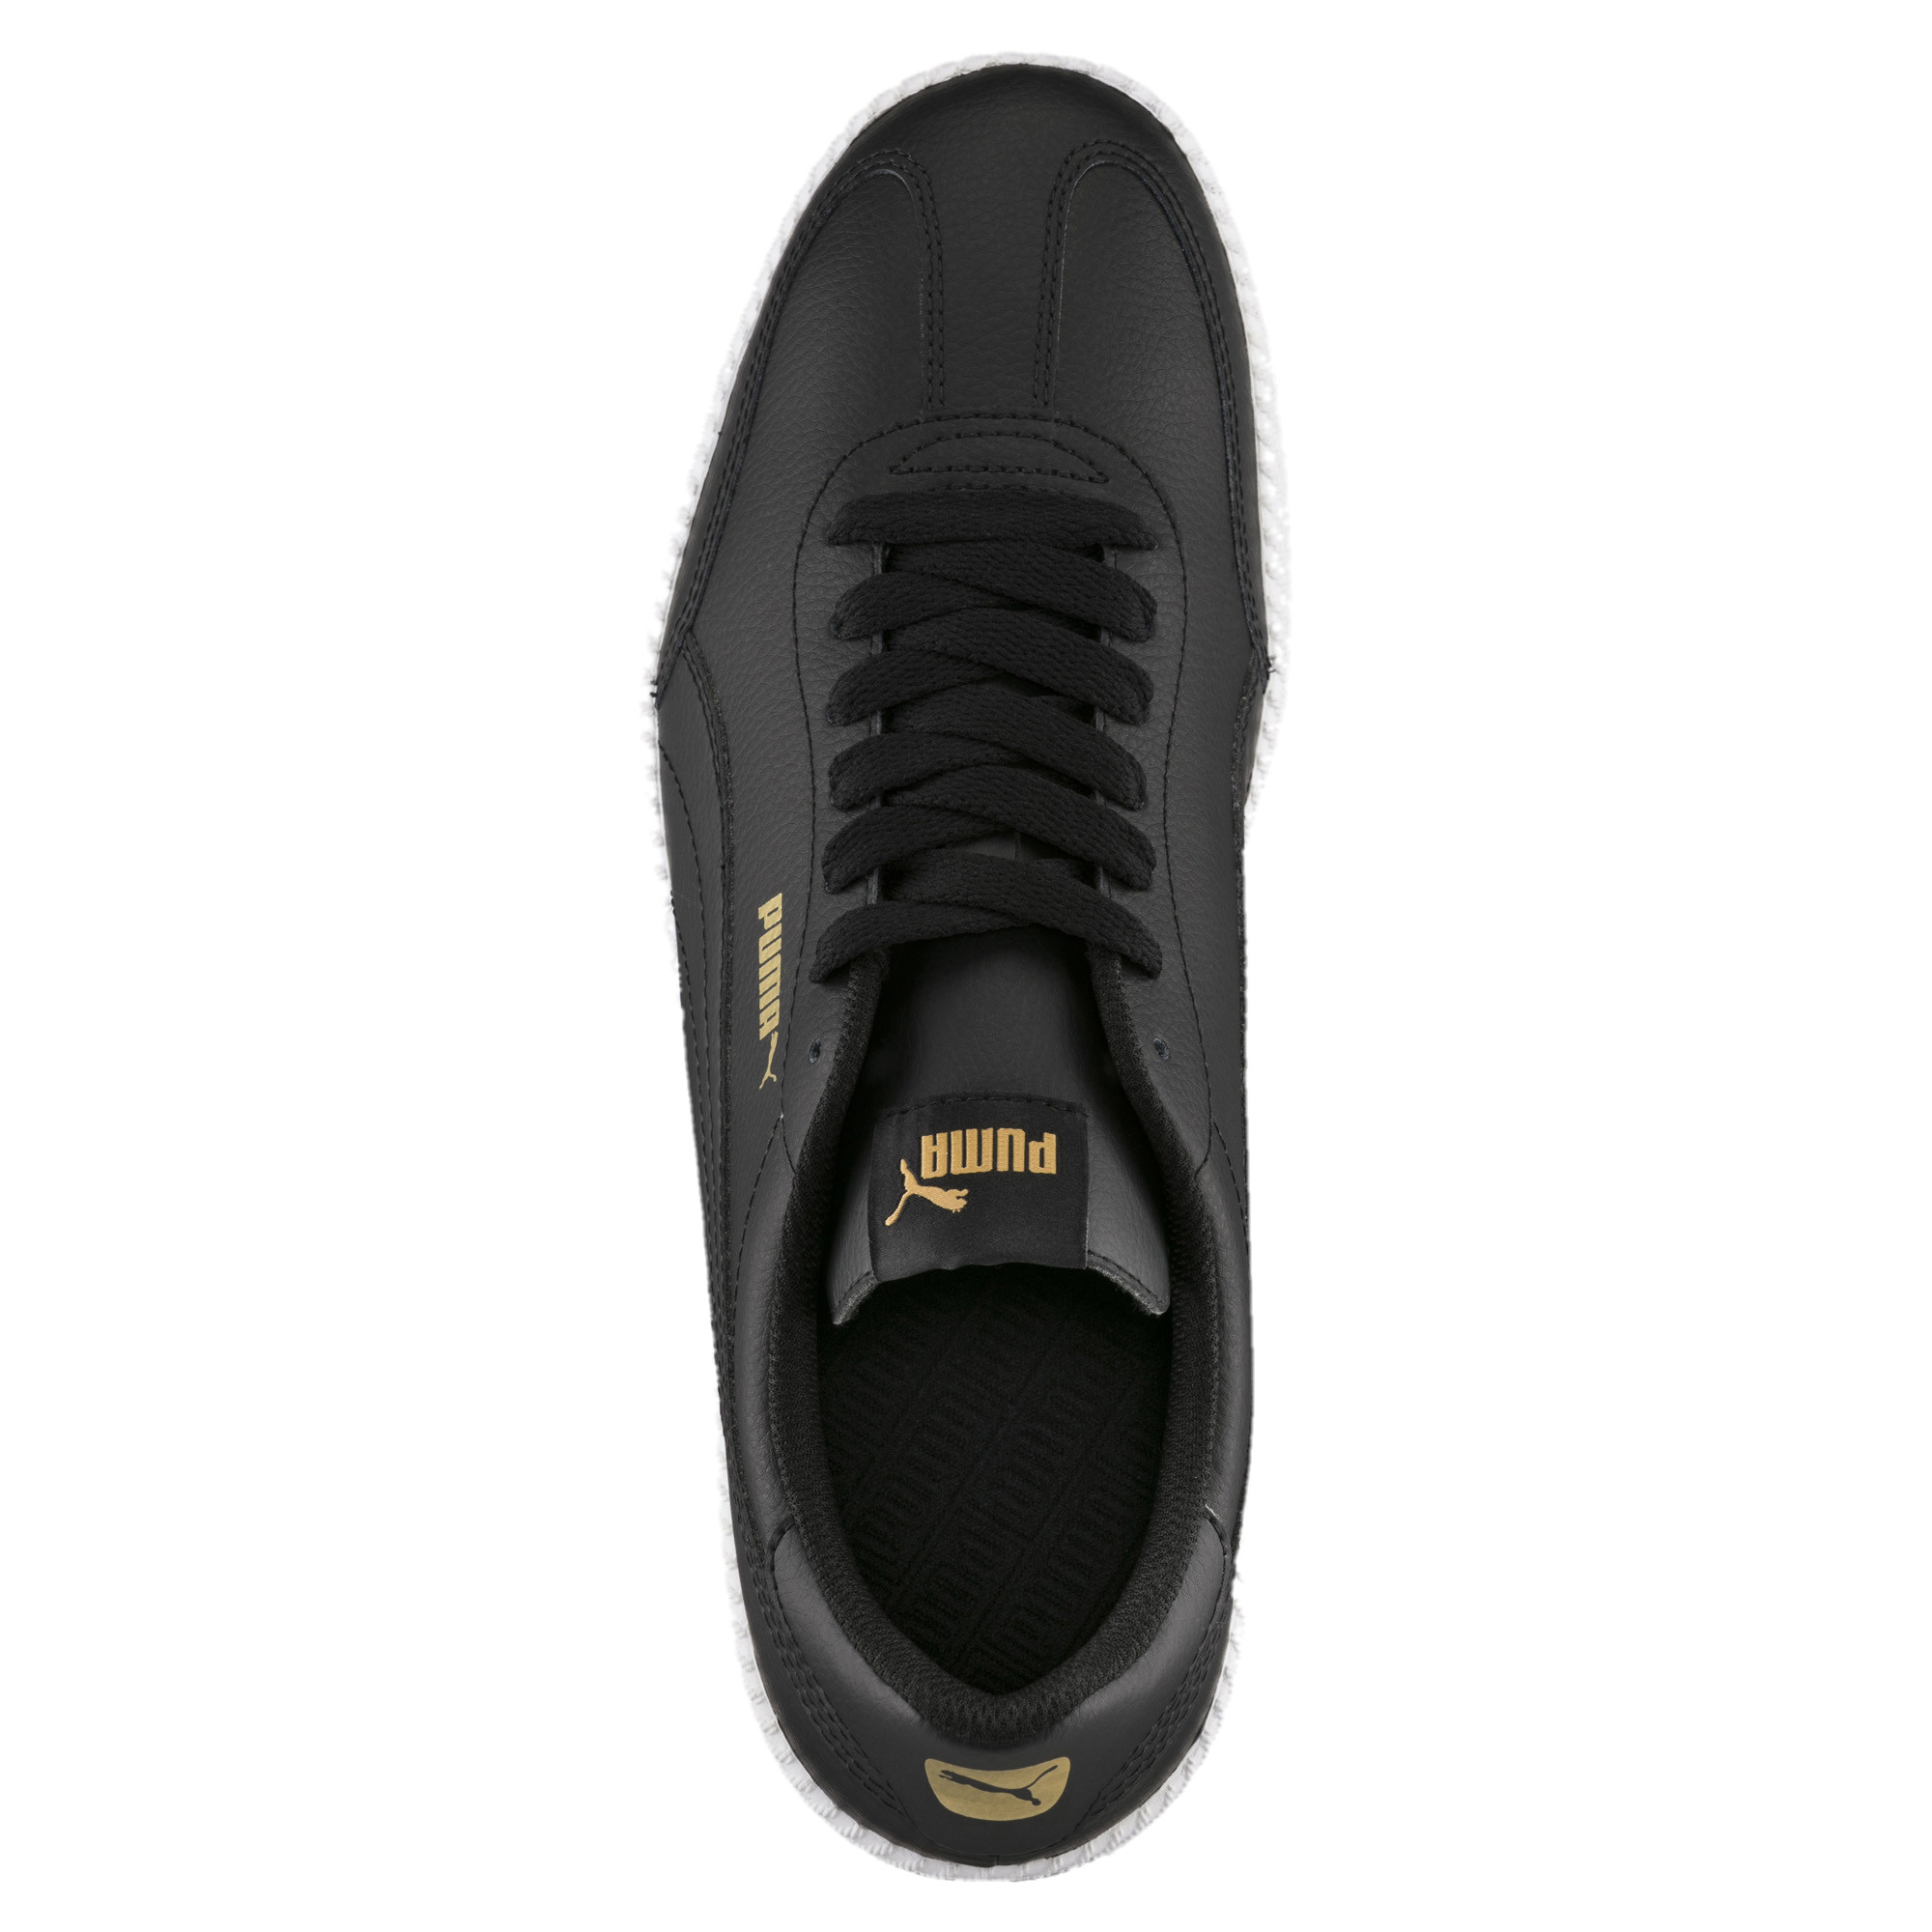 PUMA-Astro-Cup-Leather-Trainers-Men-Shoe-Basics thumbnail 11